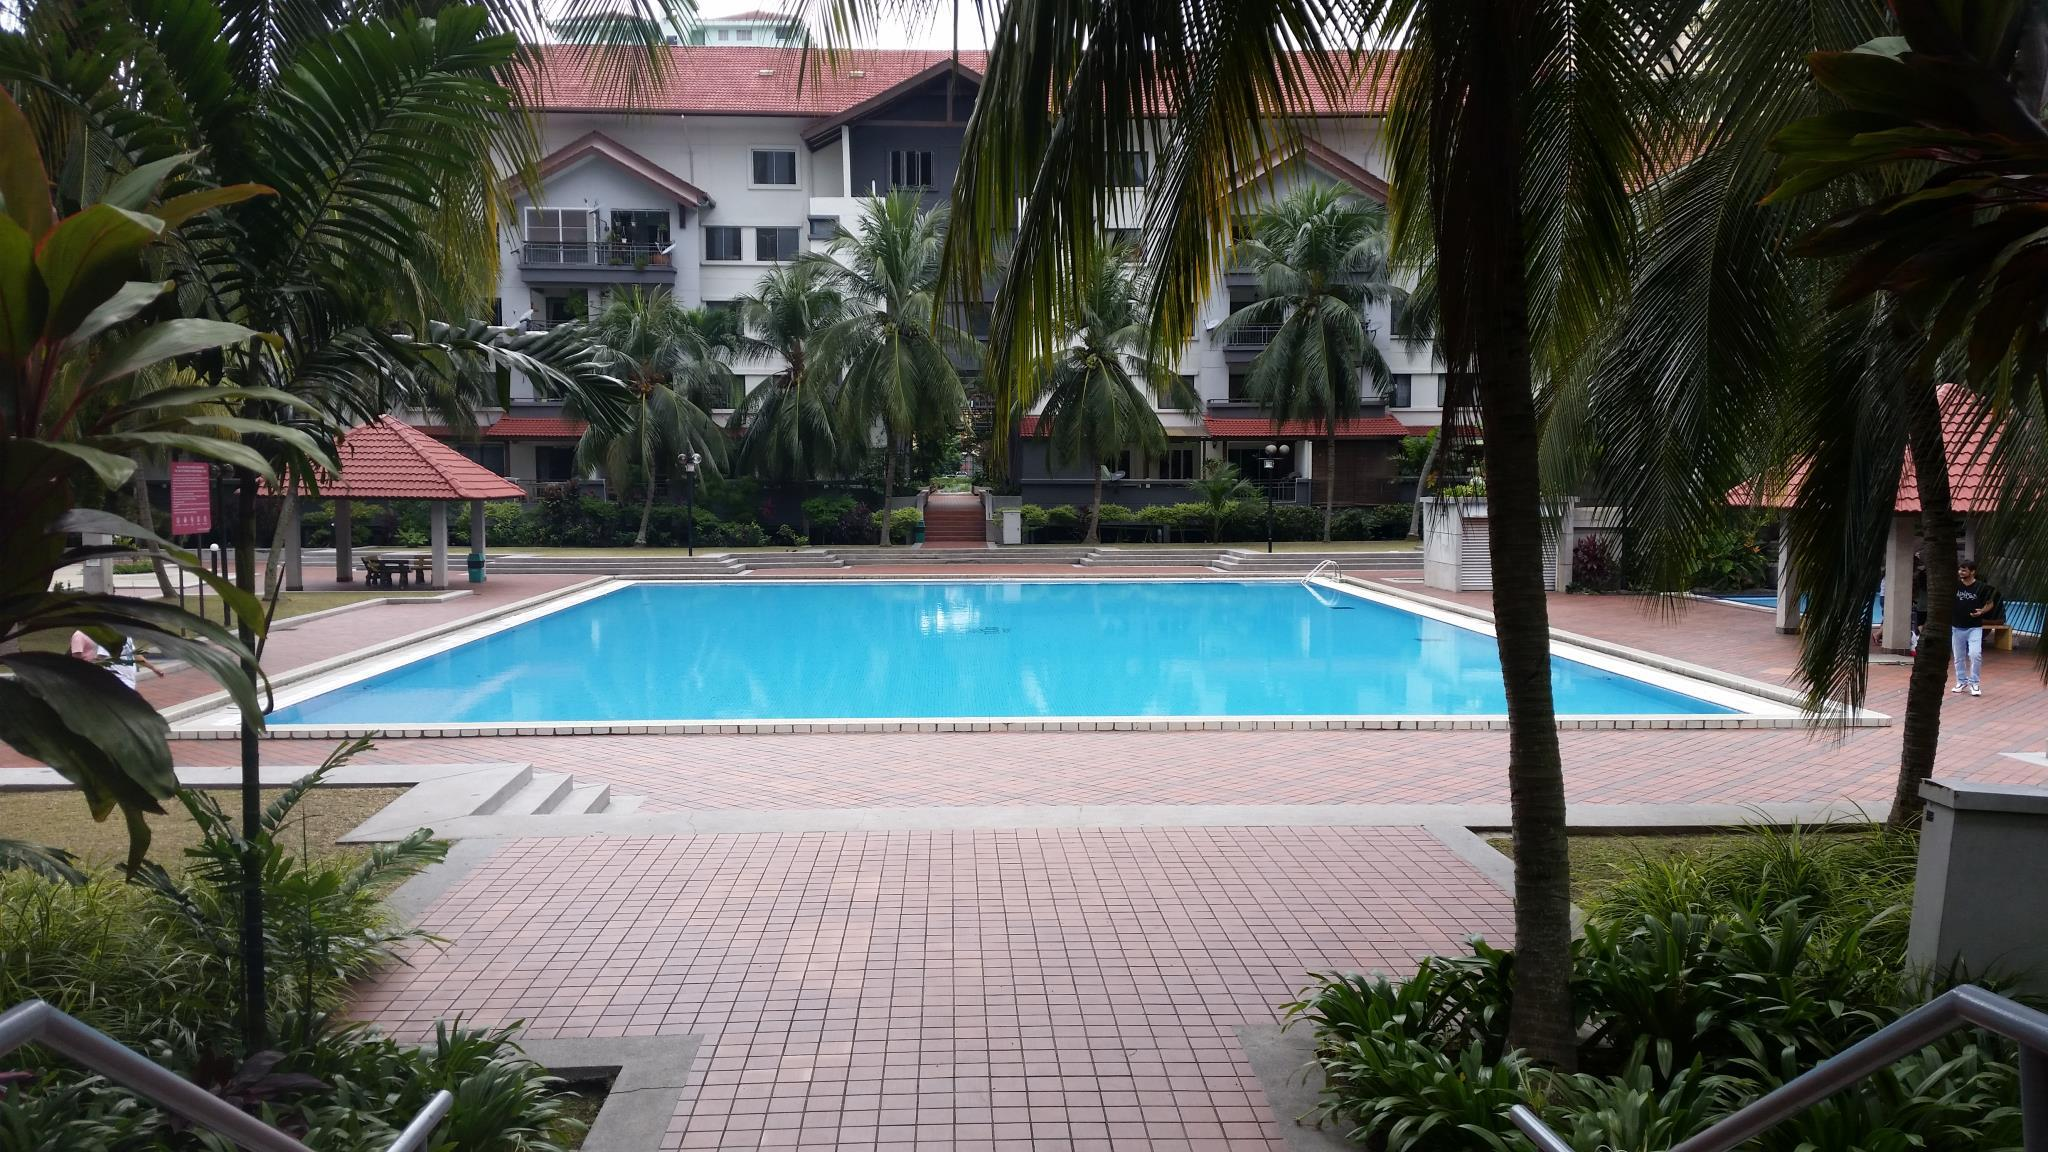 Tropical Resort Style Condominium 10min From KLCC